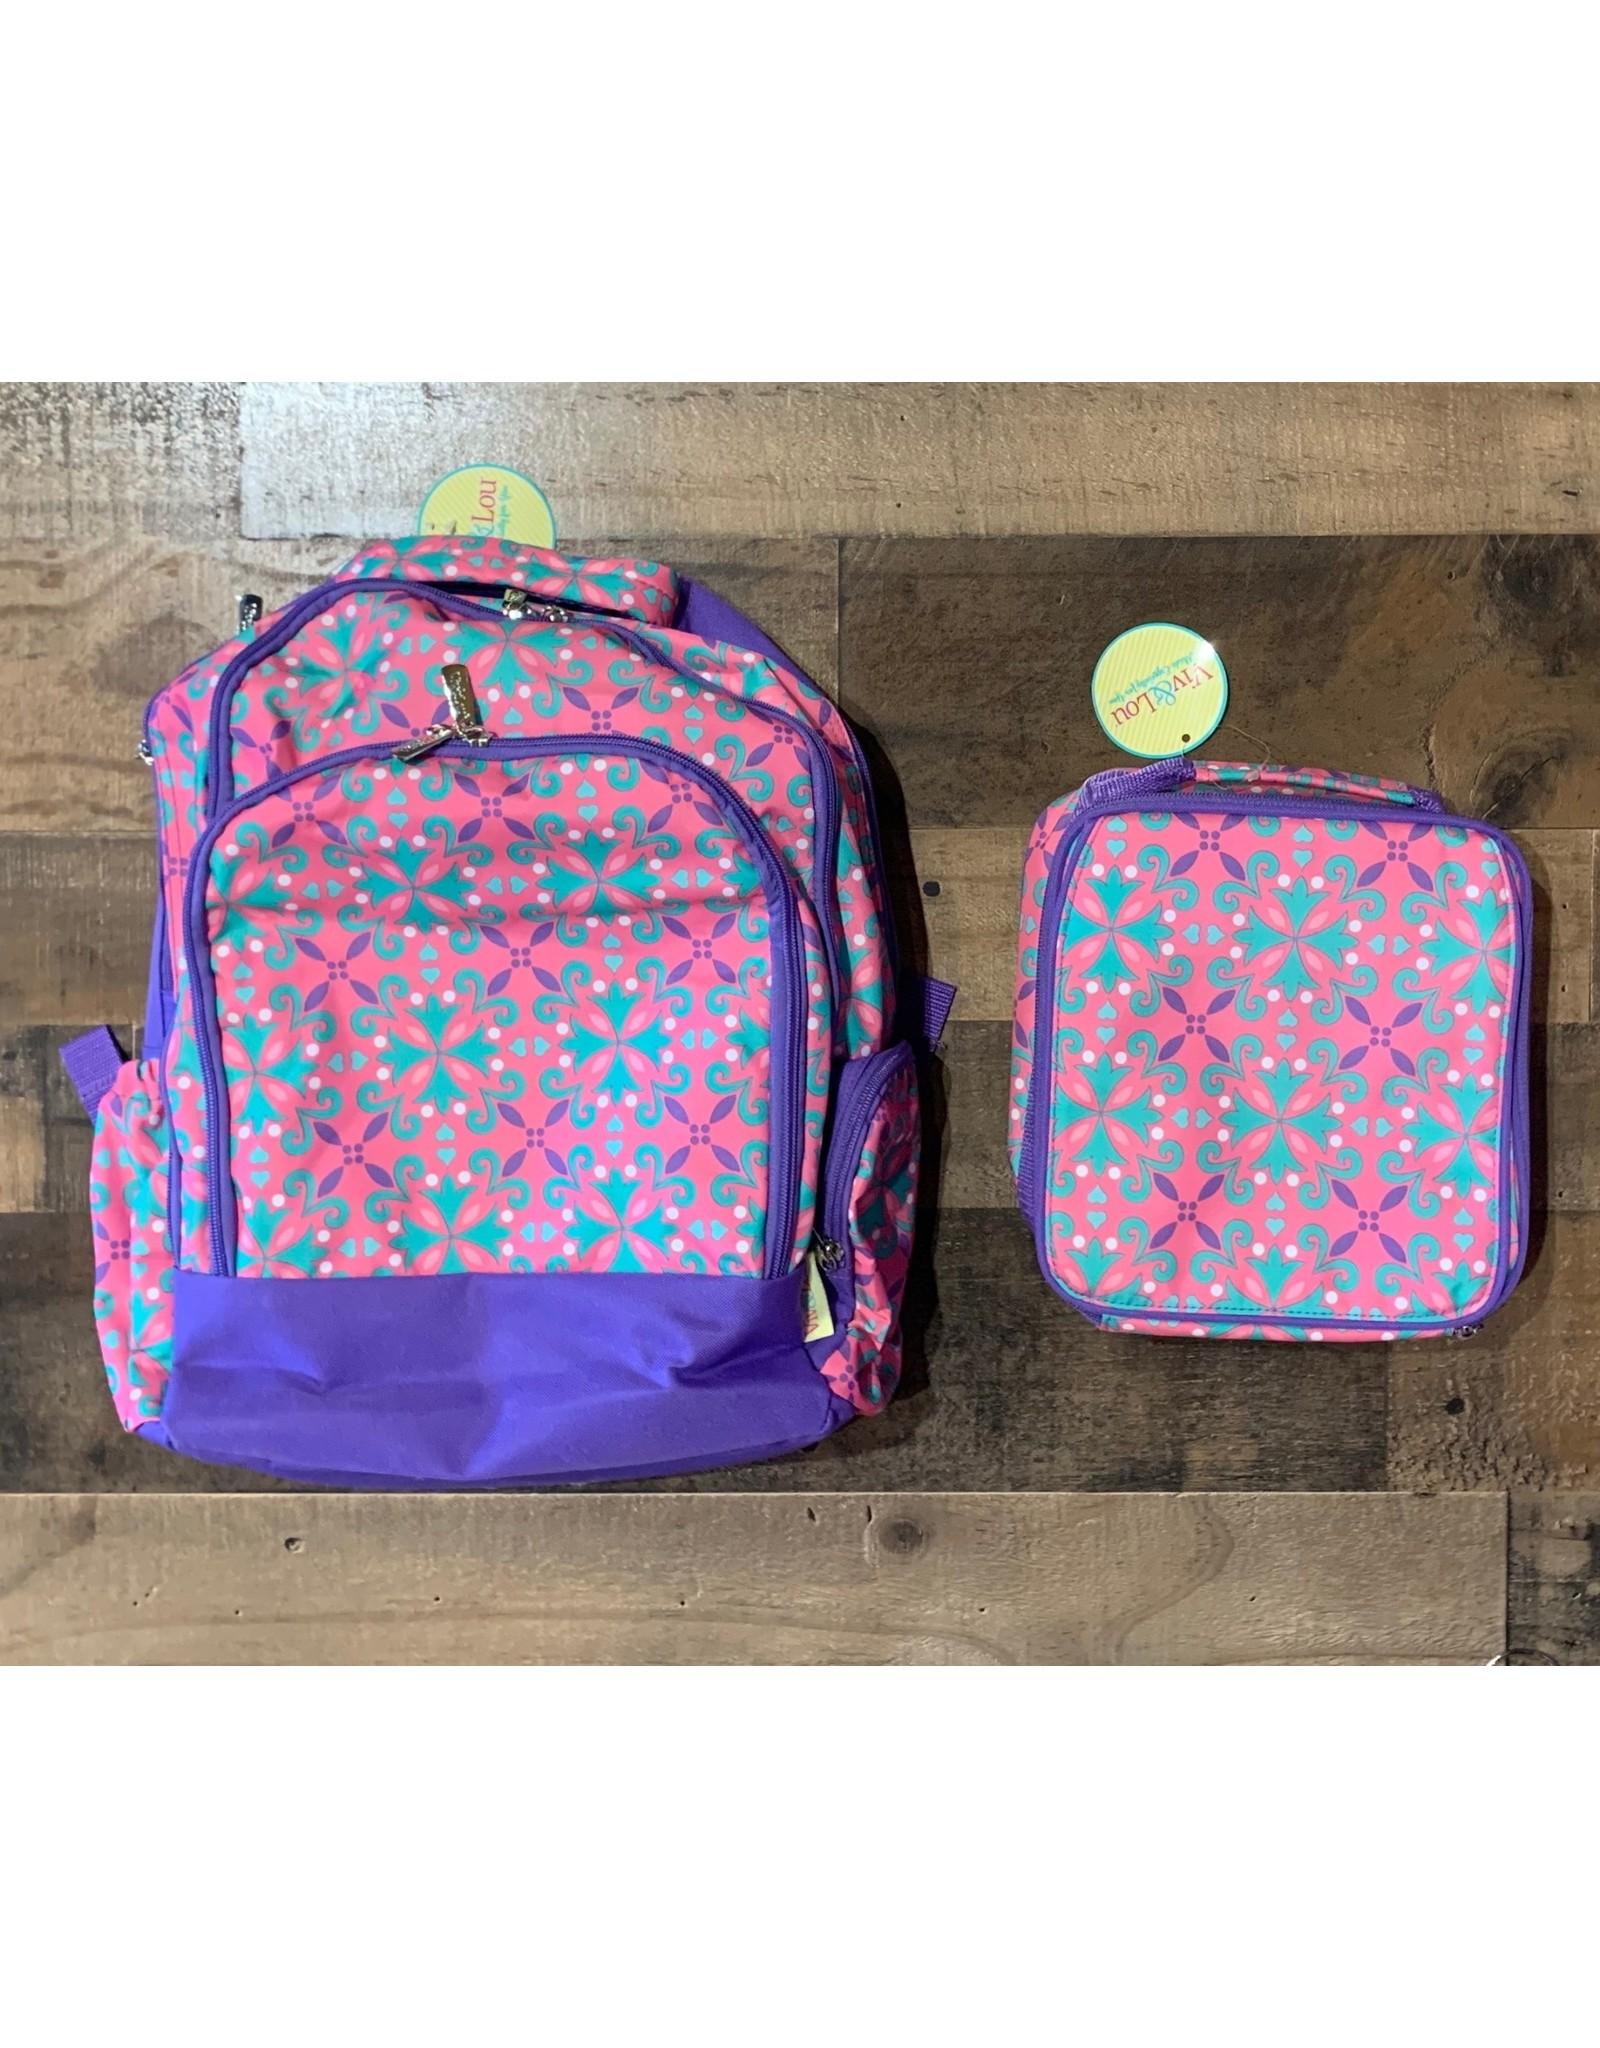 Viv & Lou- Lila Backpack & Lunch Kit Set